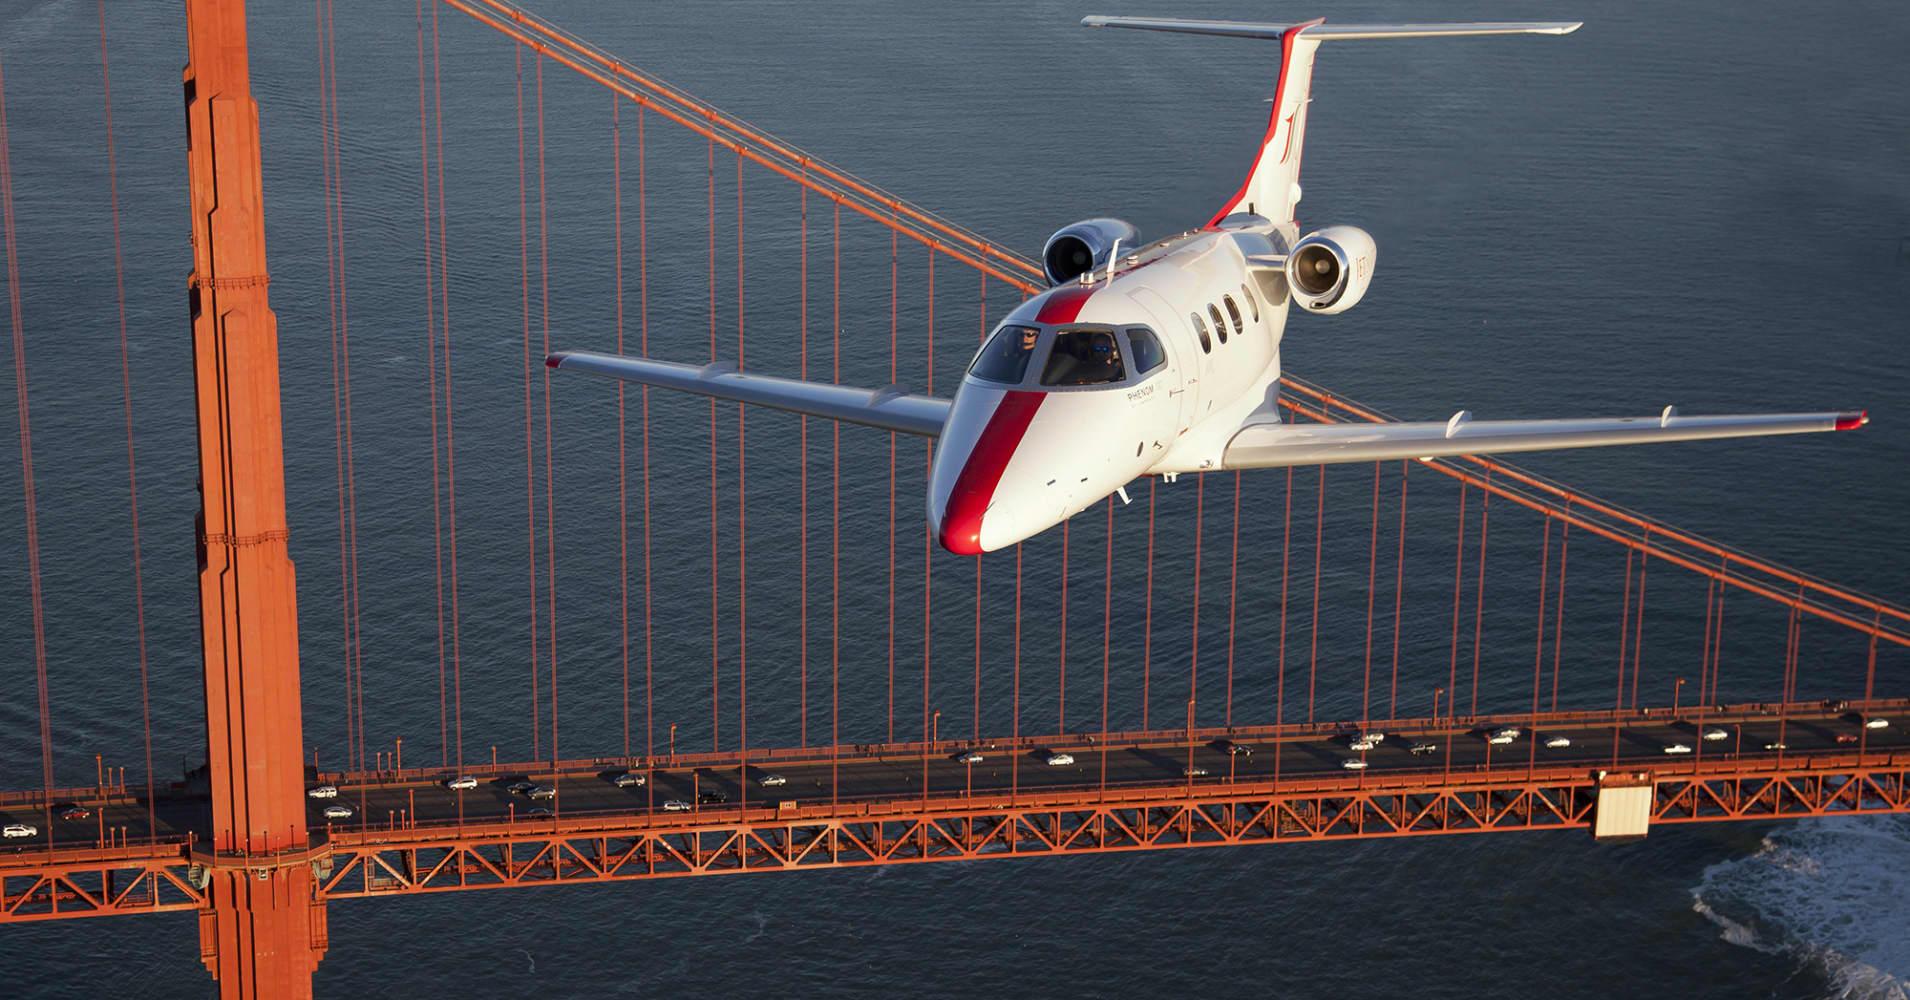 Jets flying over Golden Gate Bridge